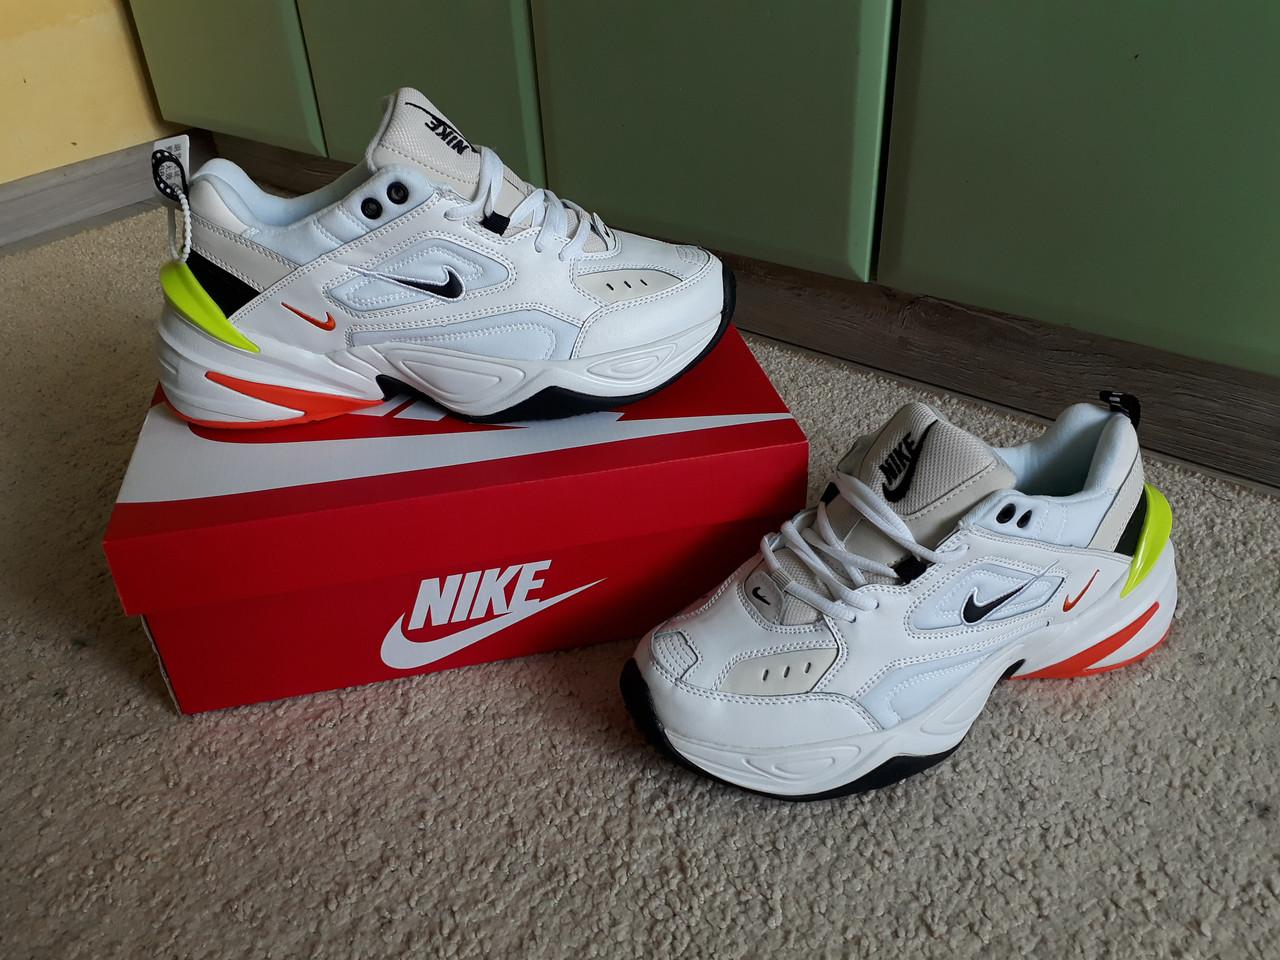 d8b97cc42990ee Мужские кроссовки Nike M2k Tekno White/Green/Orange белые с зеленым  оранжевым